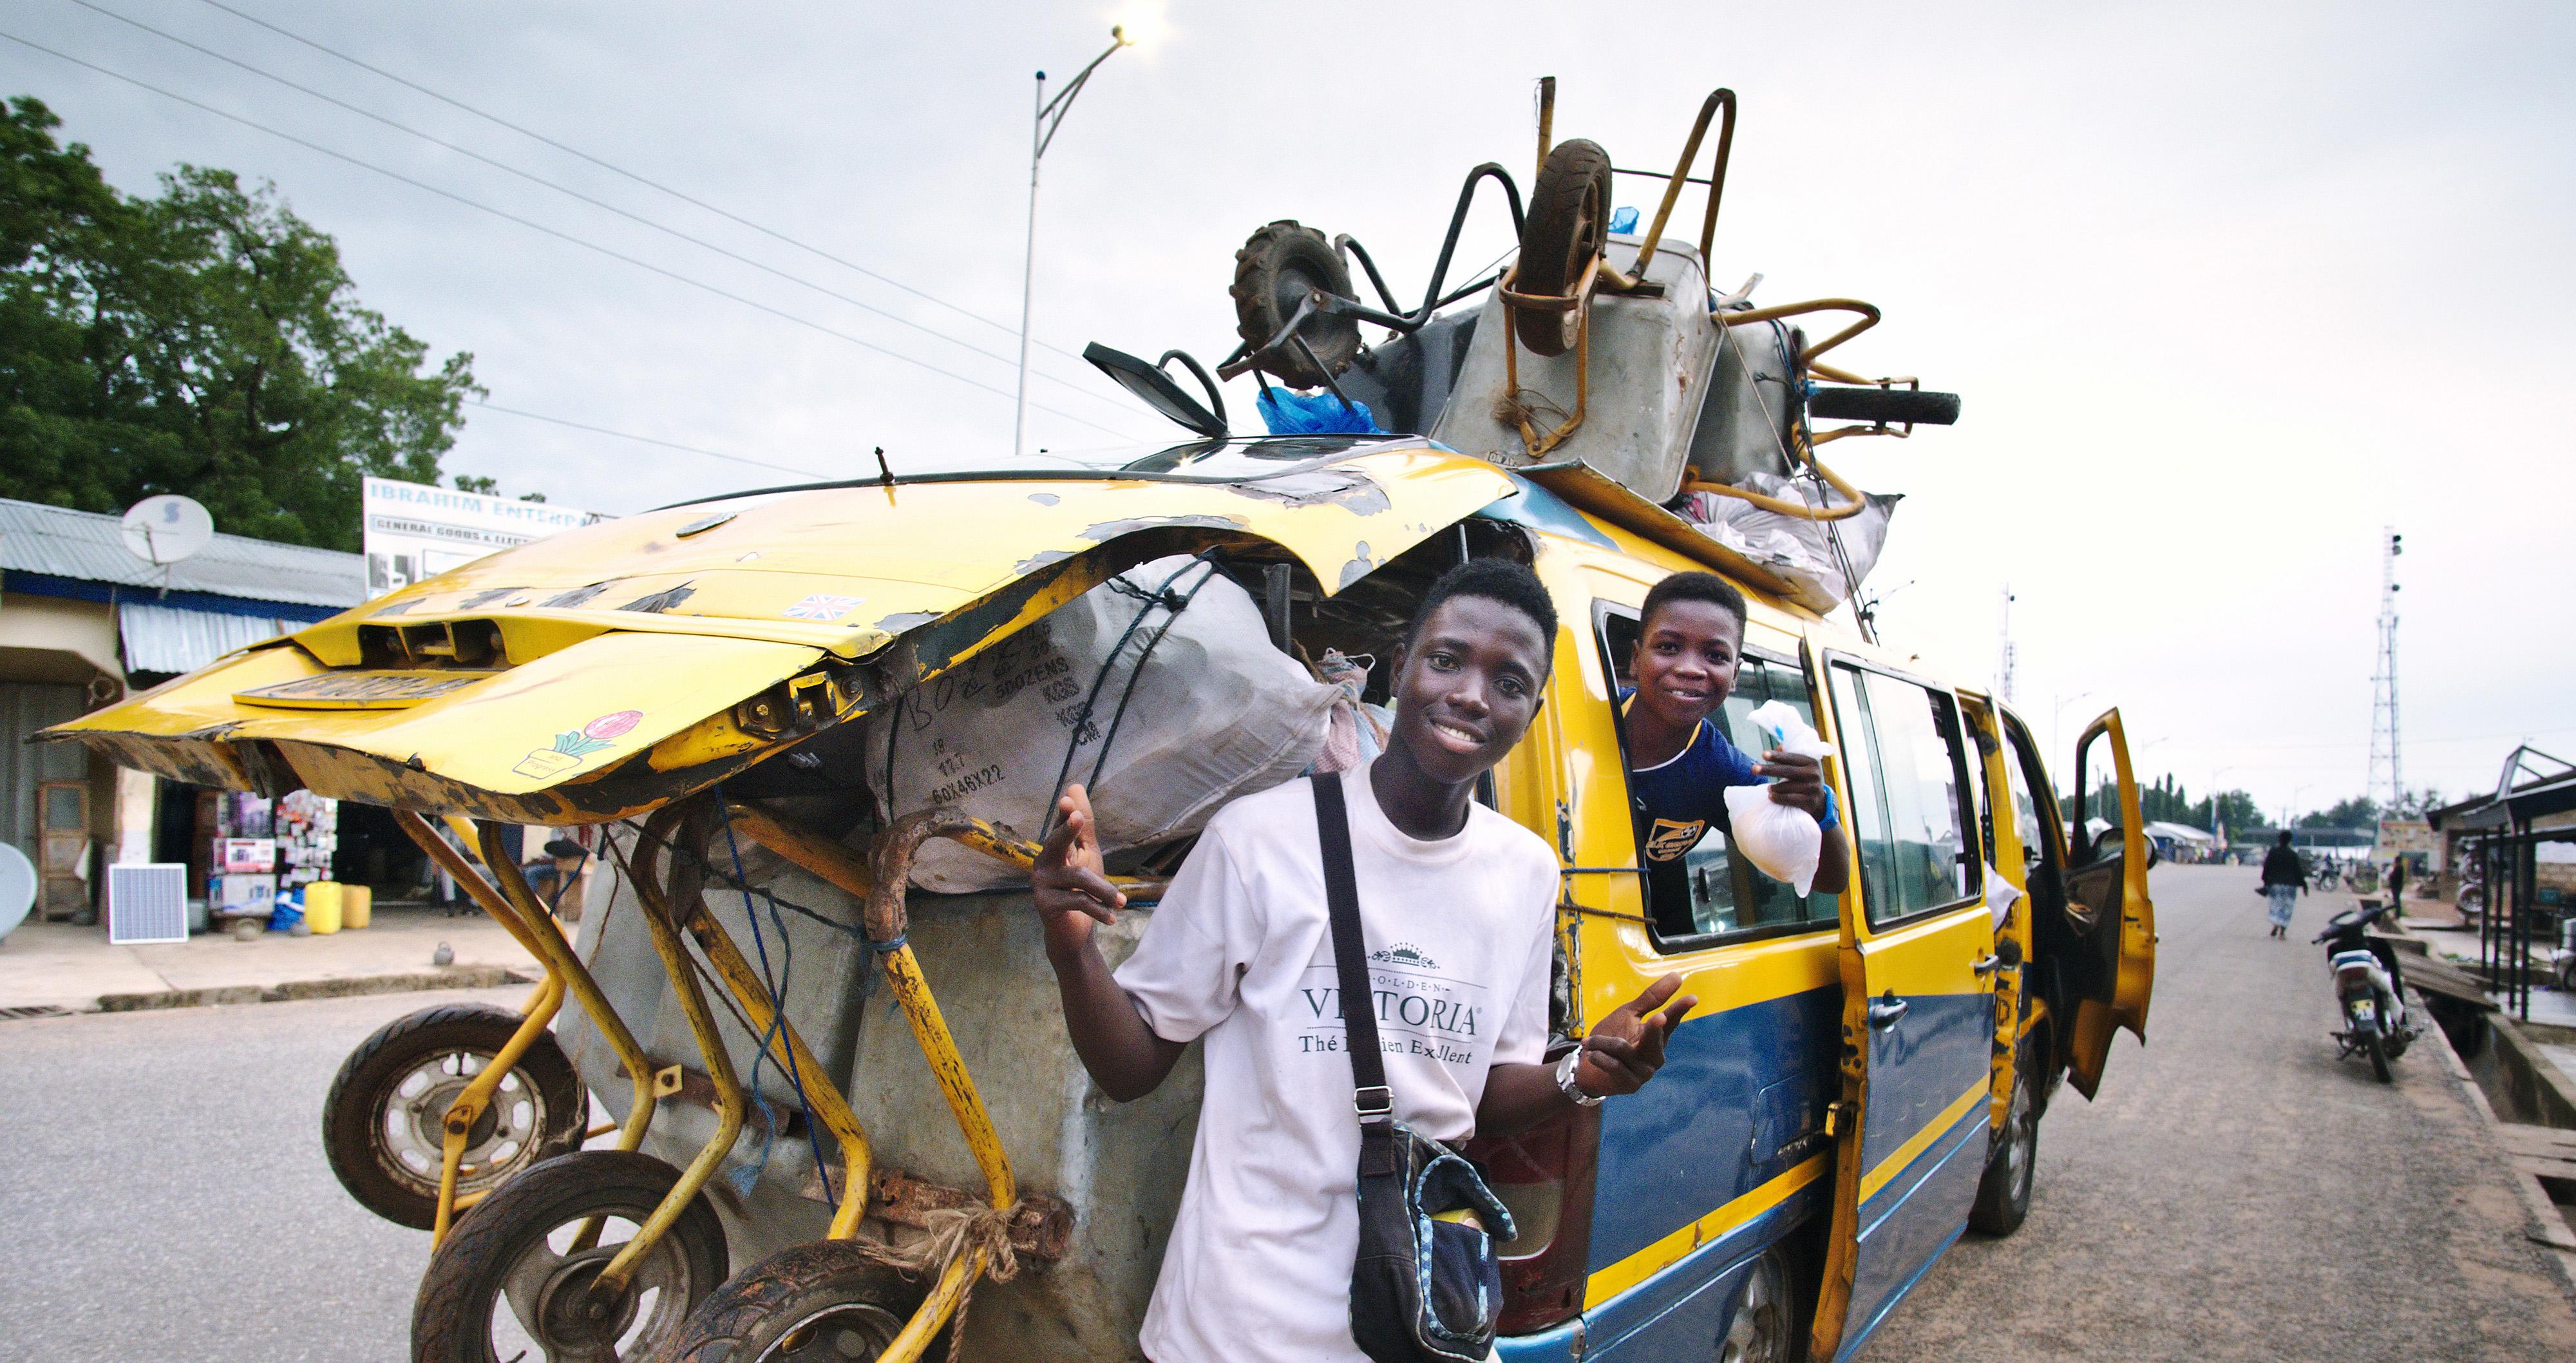 Trotro minibus Ghana © Nancy Chuang, @nancyc_huang